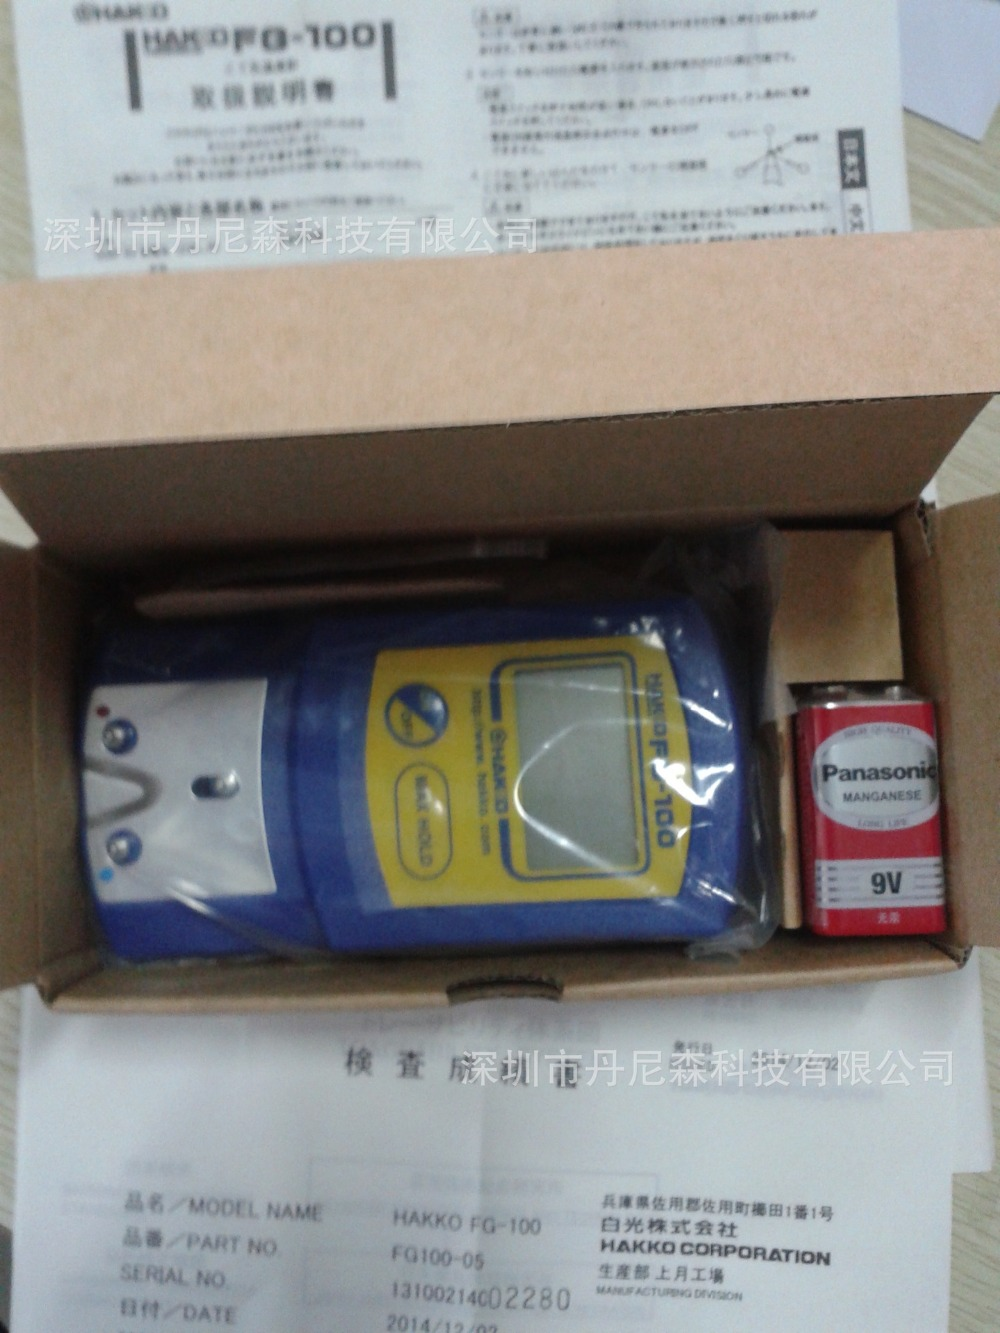 купить FG-100 Soldering Iron Tip Thermometer  Iron thermometer Replacement 191 недорого